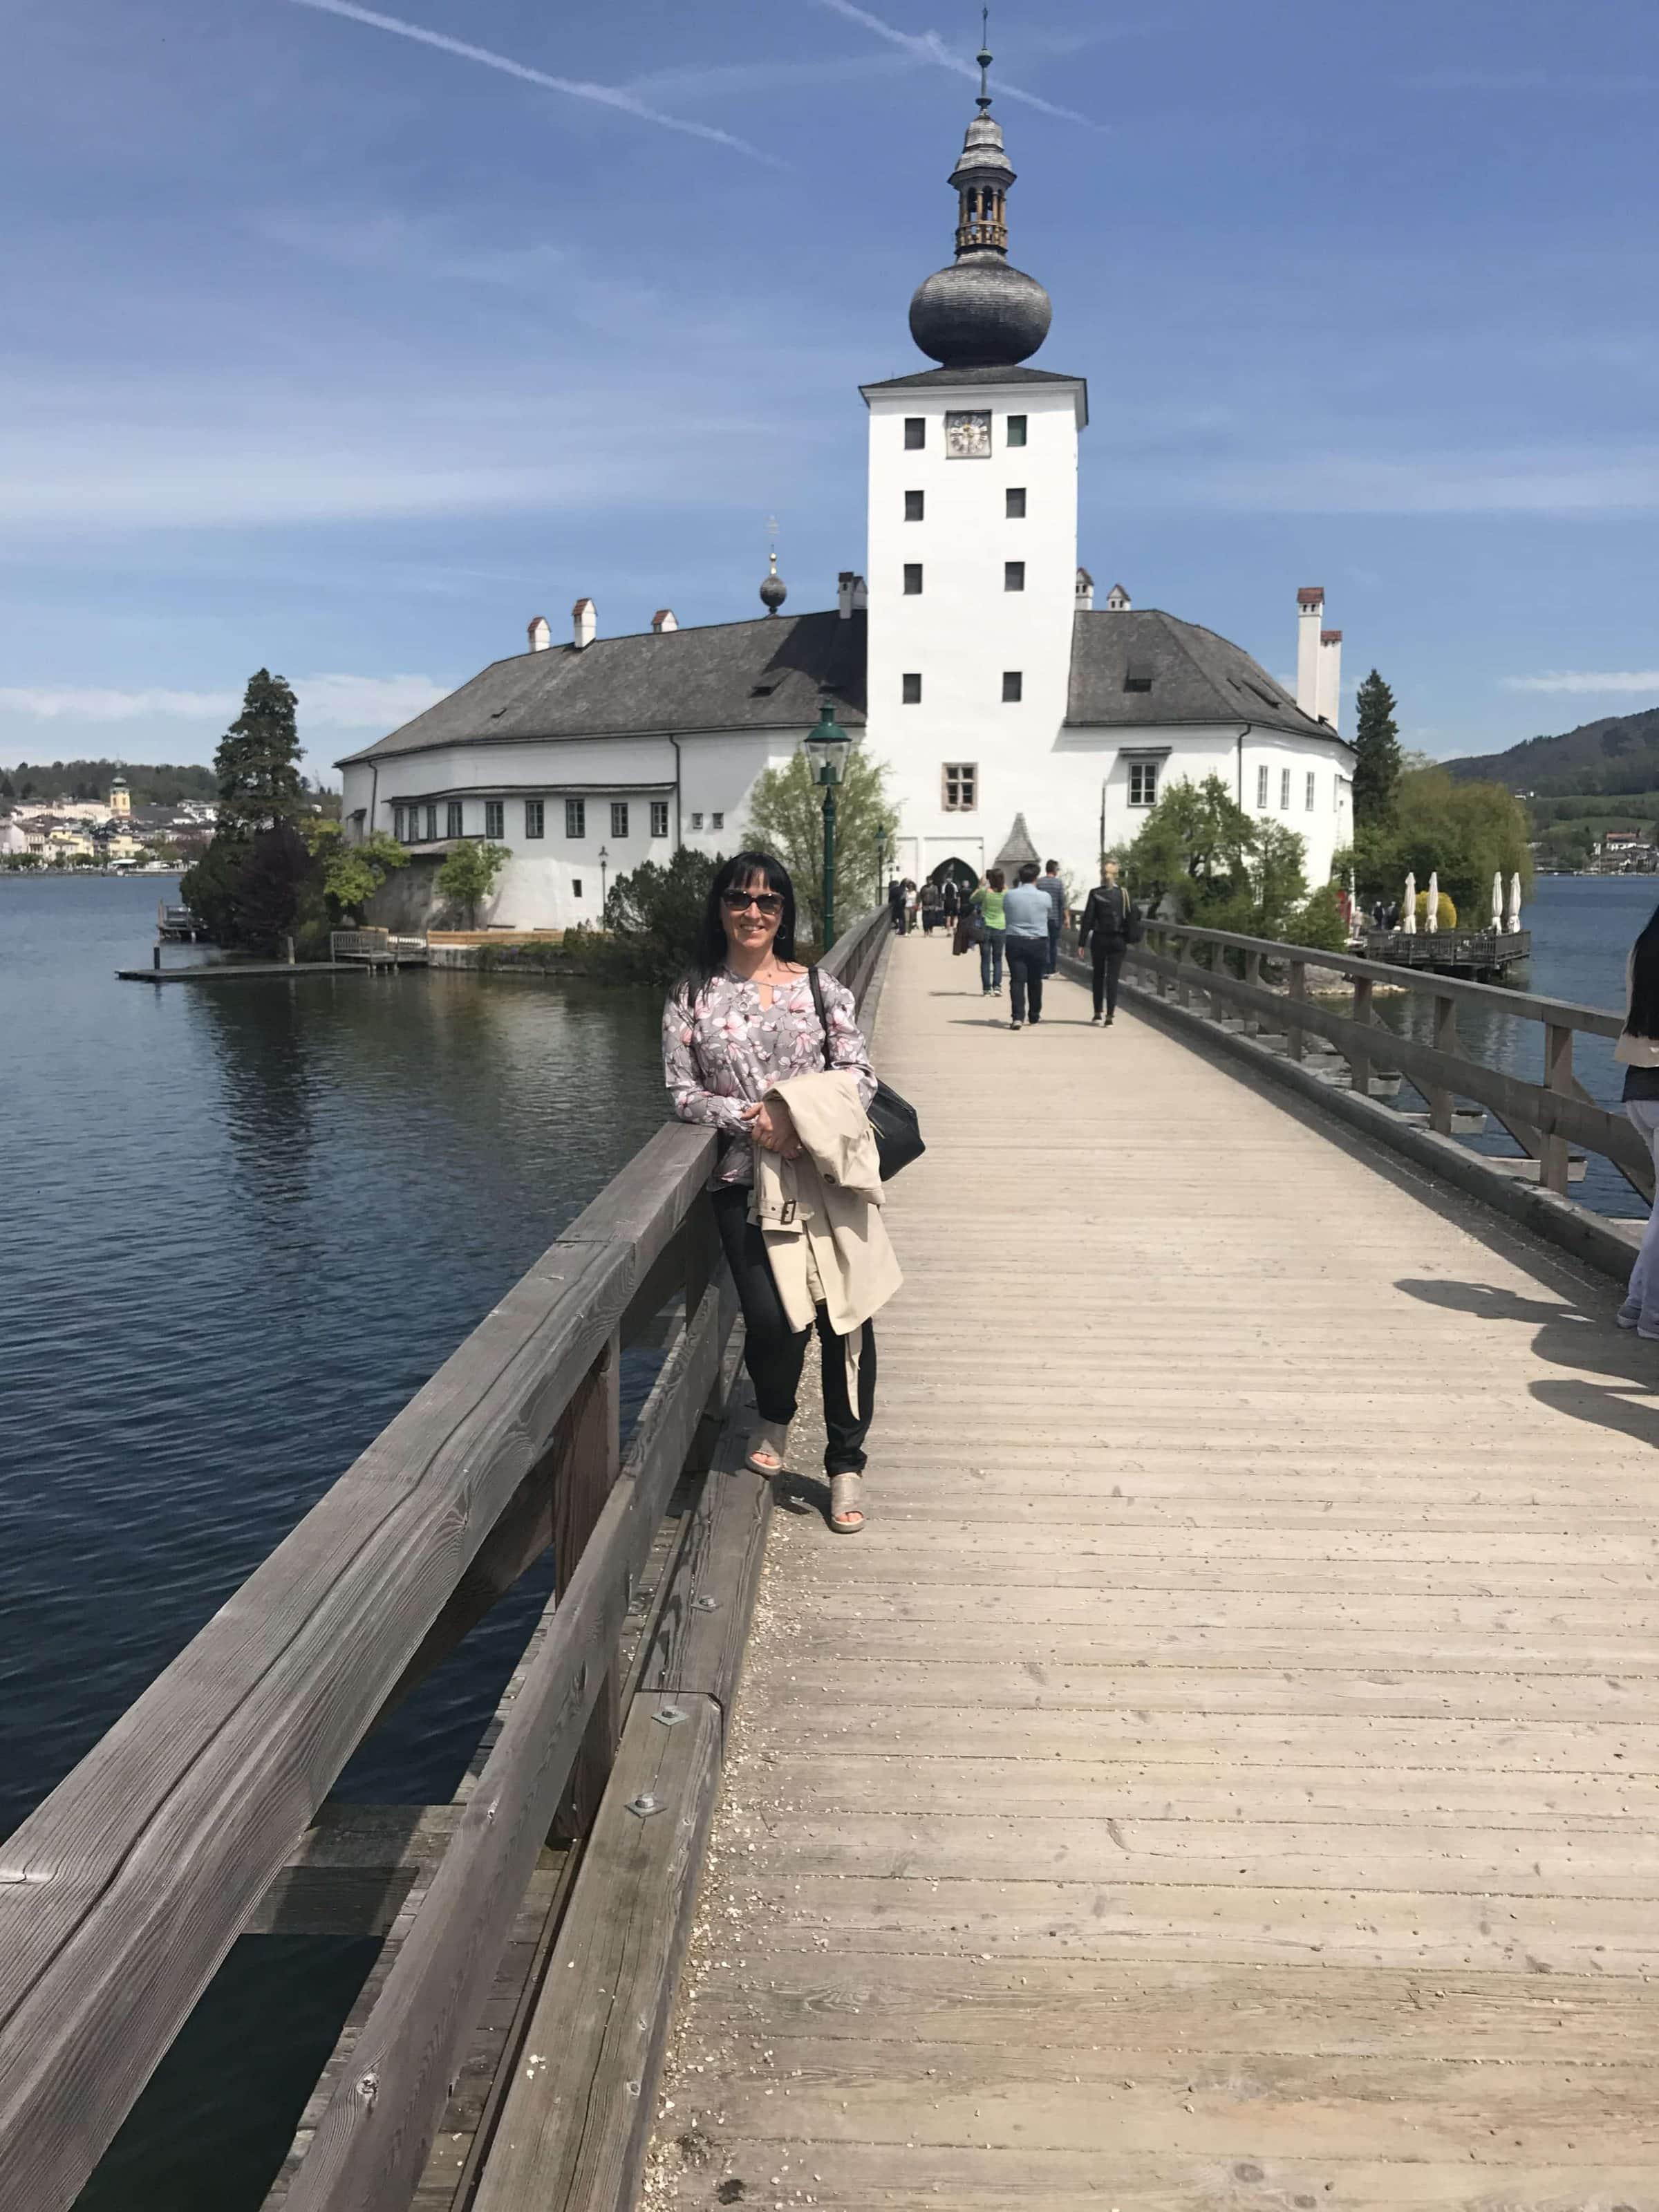 Travellingcarola vor dem Seeschloss Ort in Gmunden